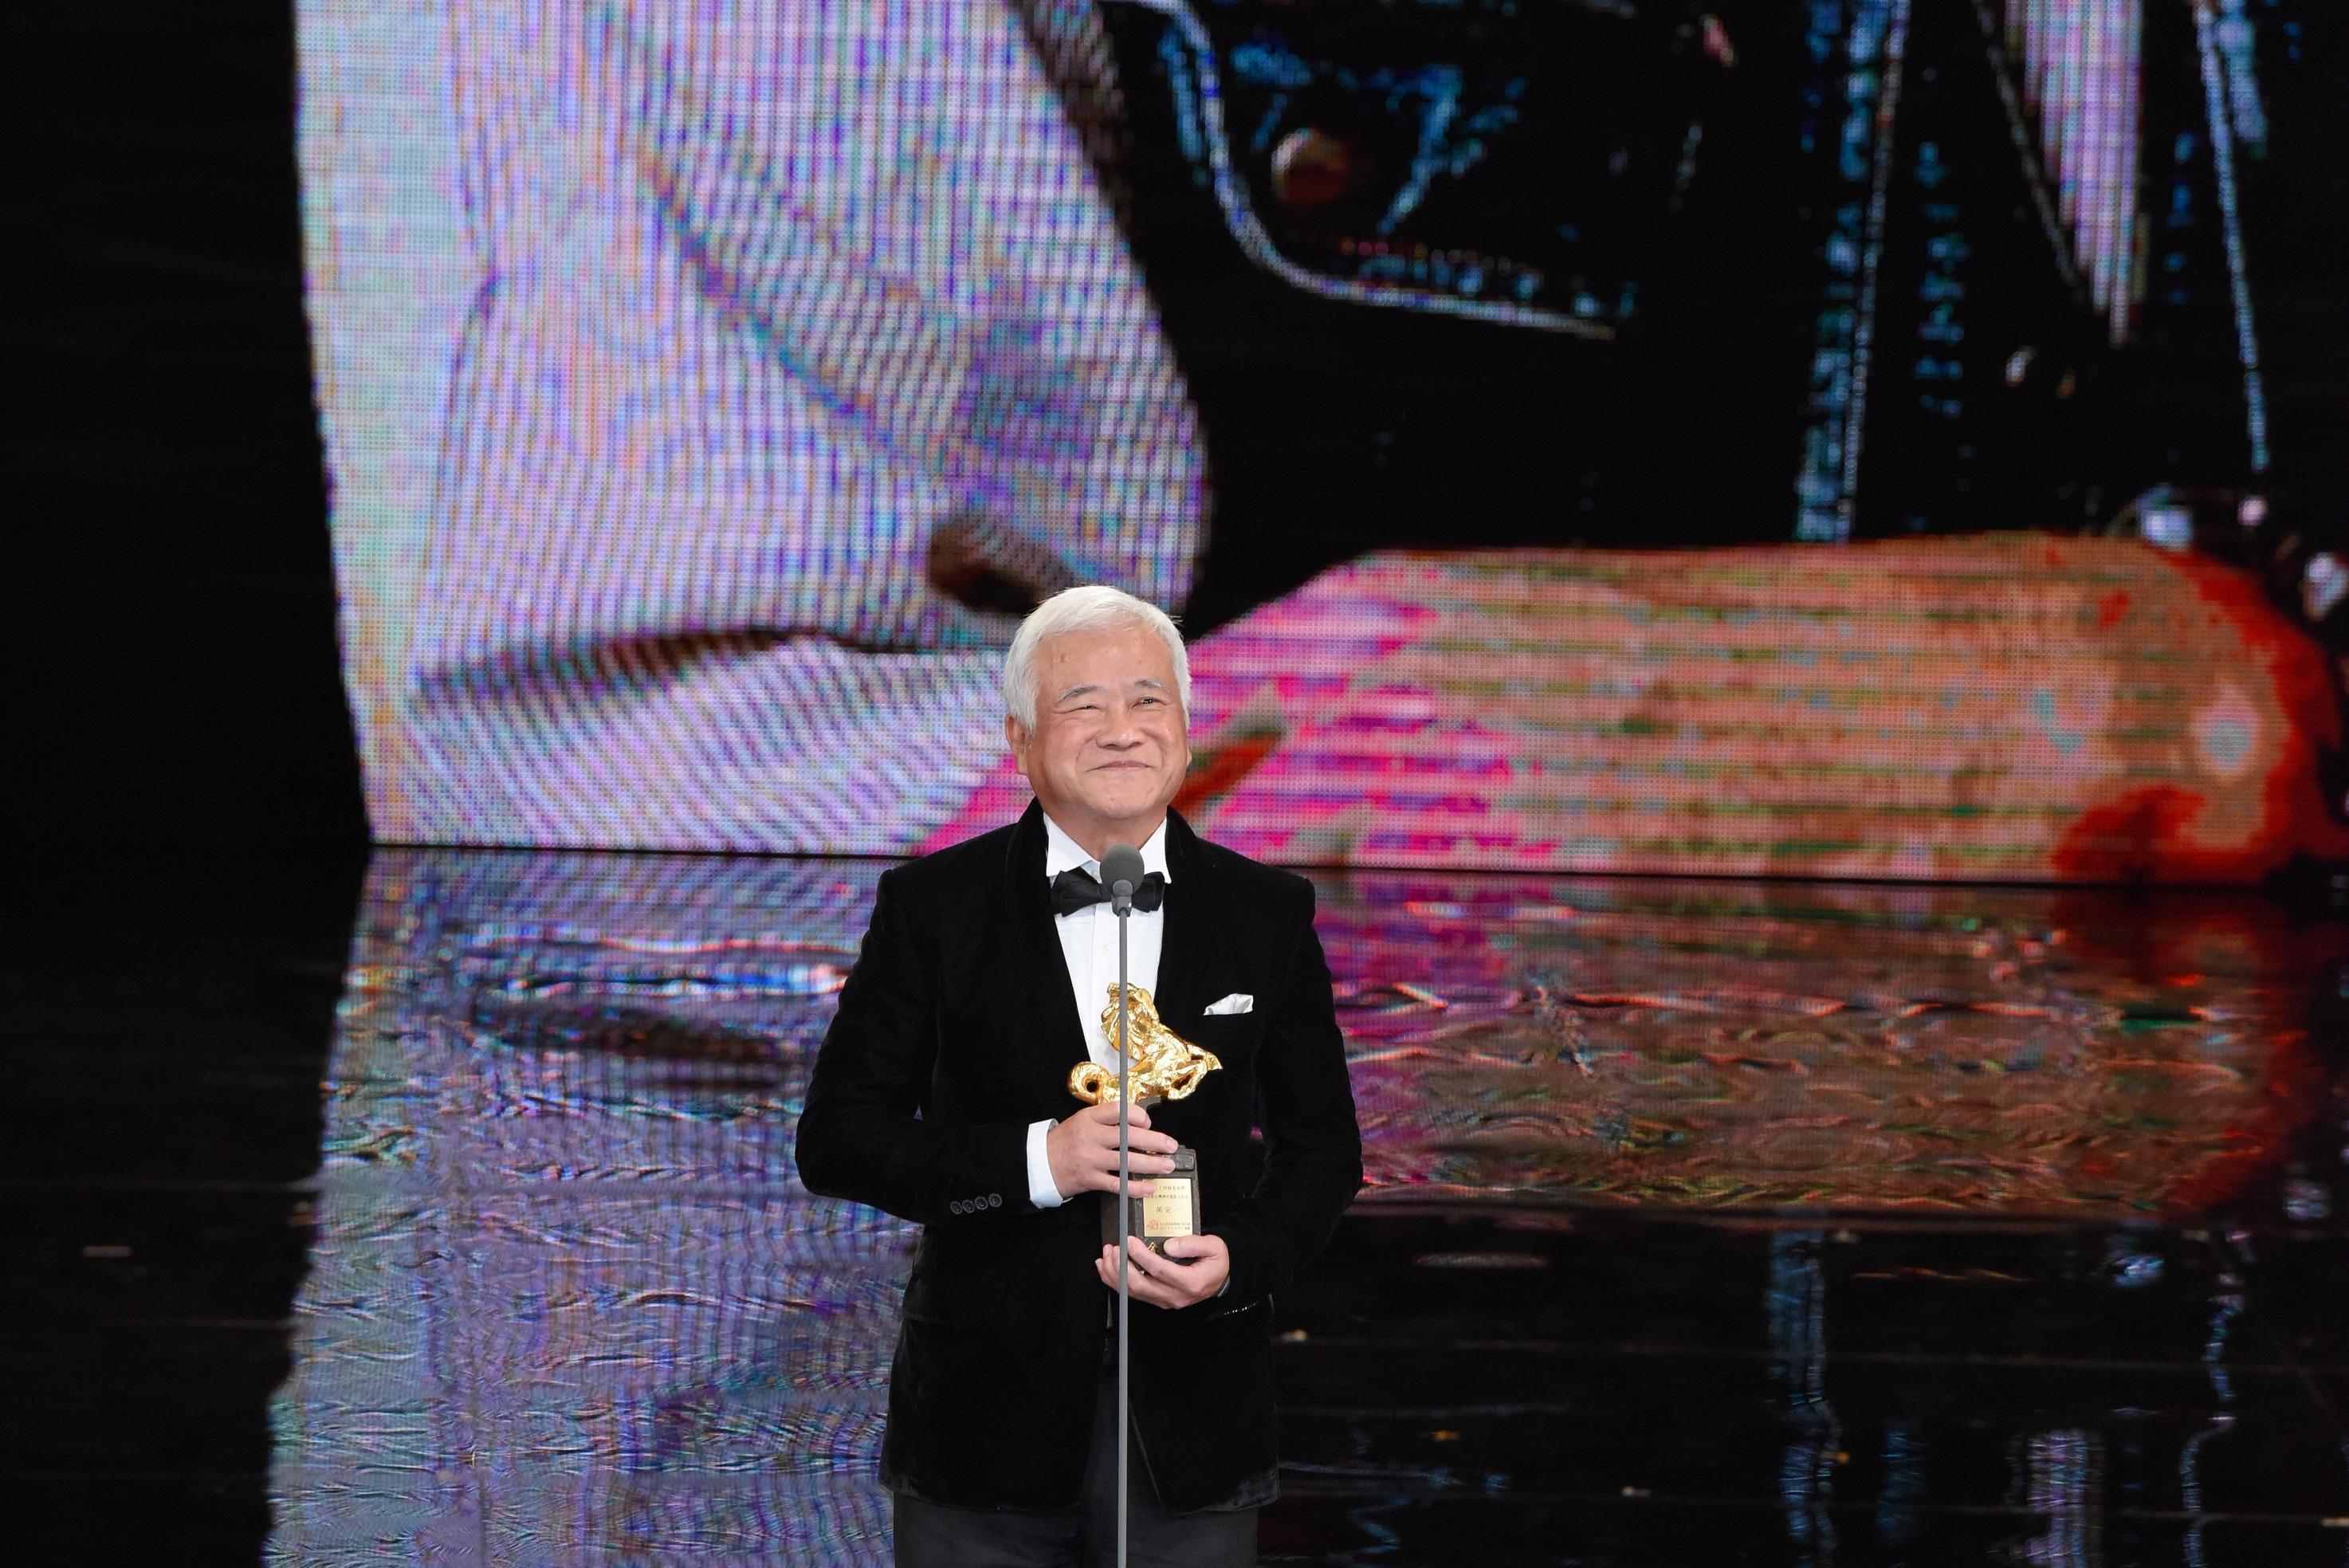 <p>第54屆金馬年度台灣傑出電影工作者,頒給國寶級擬音師胡定一。他說,自己40餘年的從業精神,就是「堅持,沒有一件事不會發光發熱」。(影像:金馬執委會提供) </p>